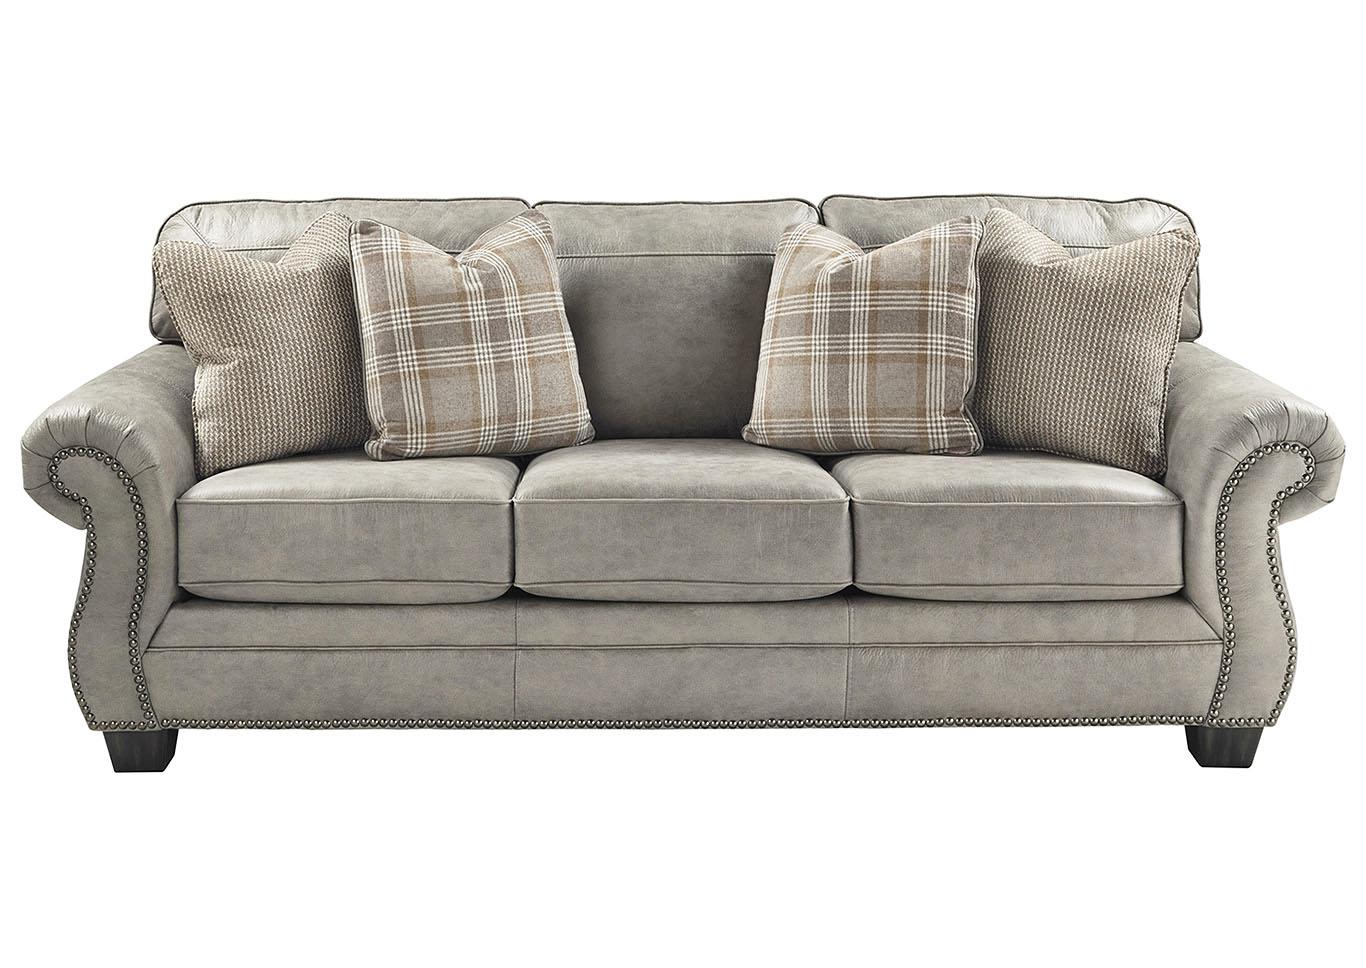 Mr. Discount Furniture - Chicago, IL Olsberg Steel Queen ...